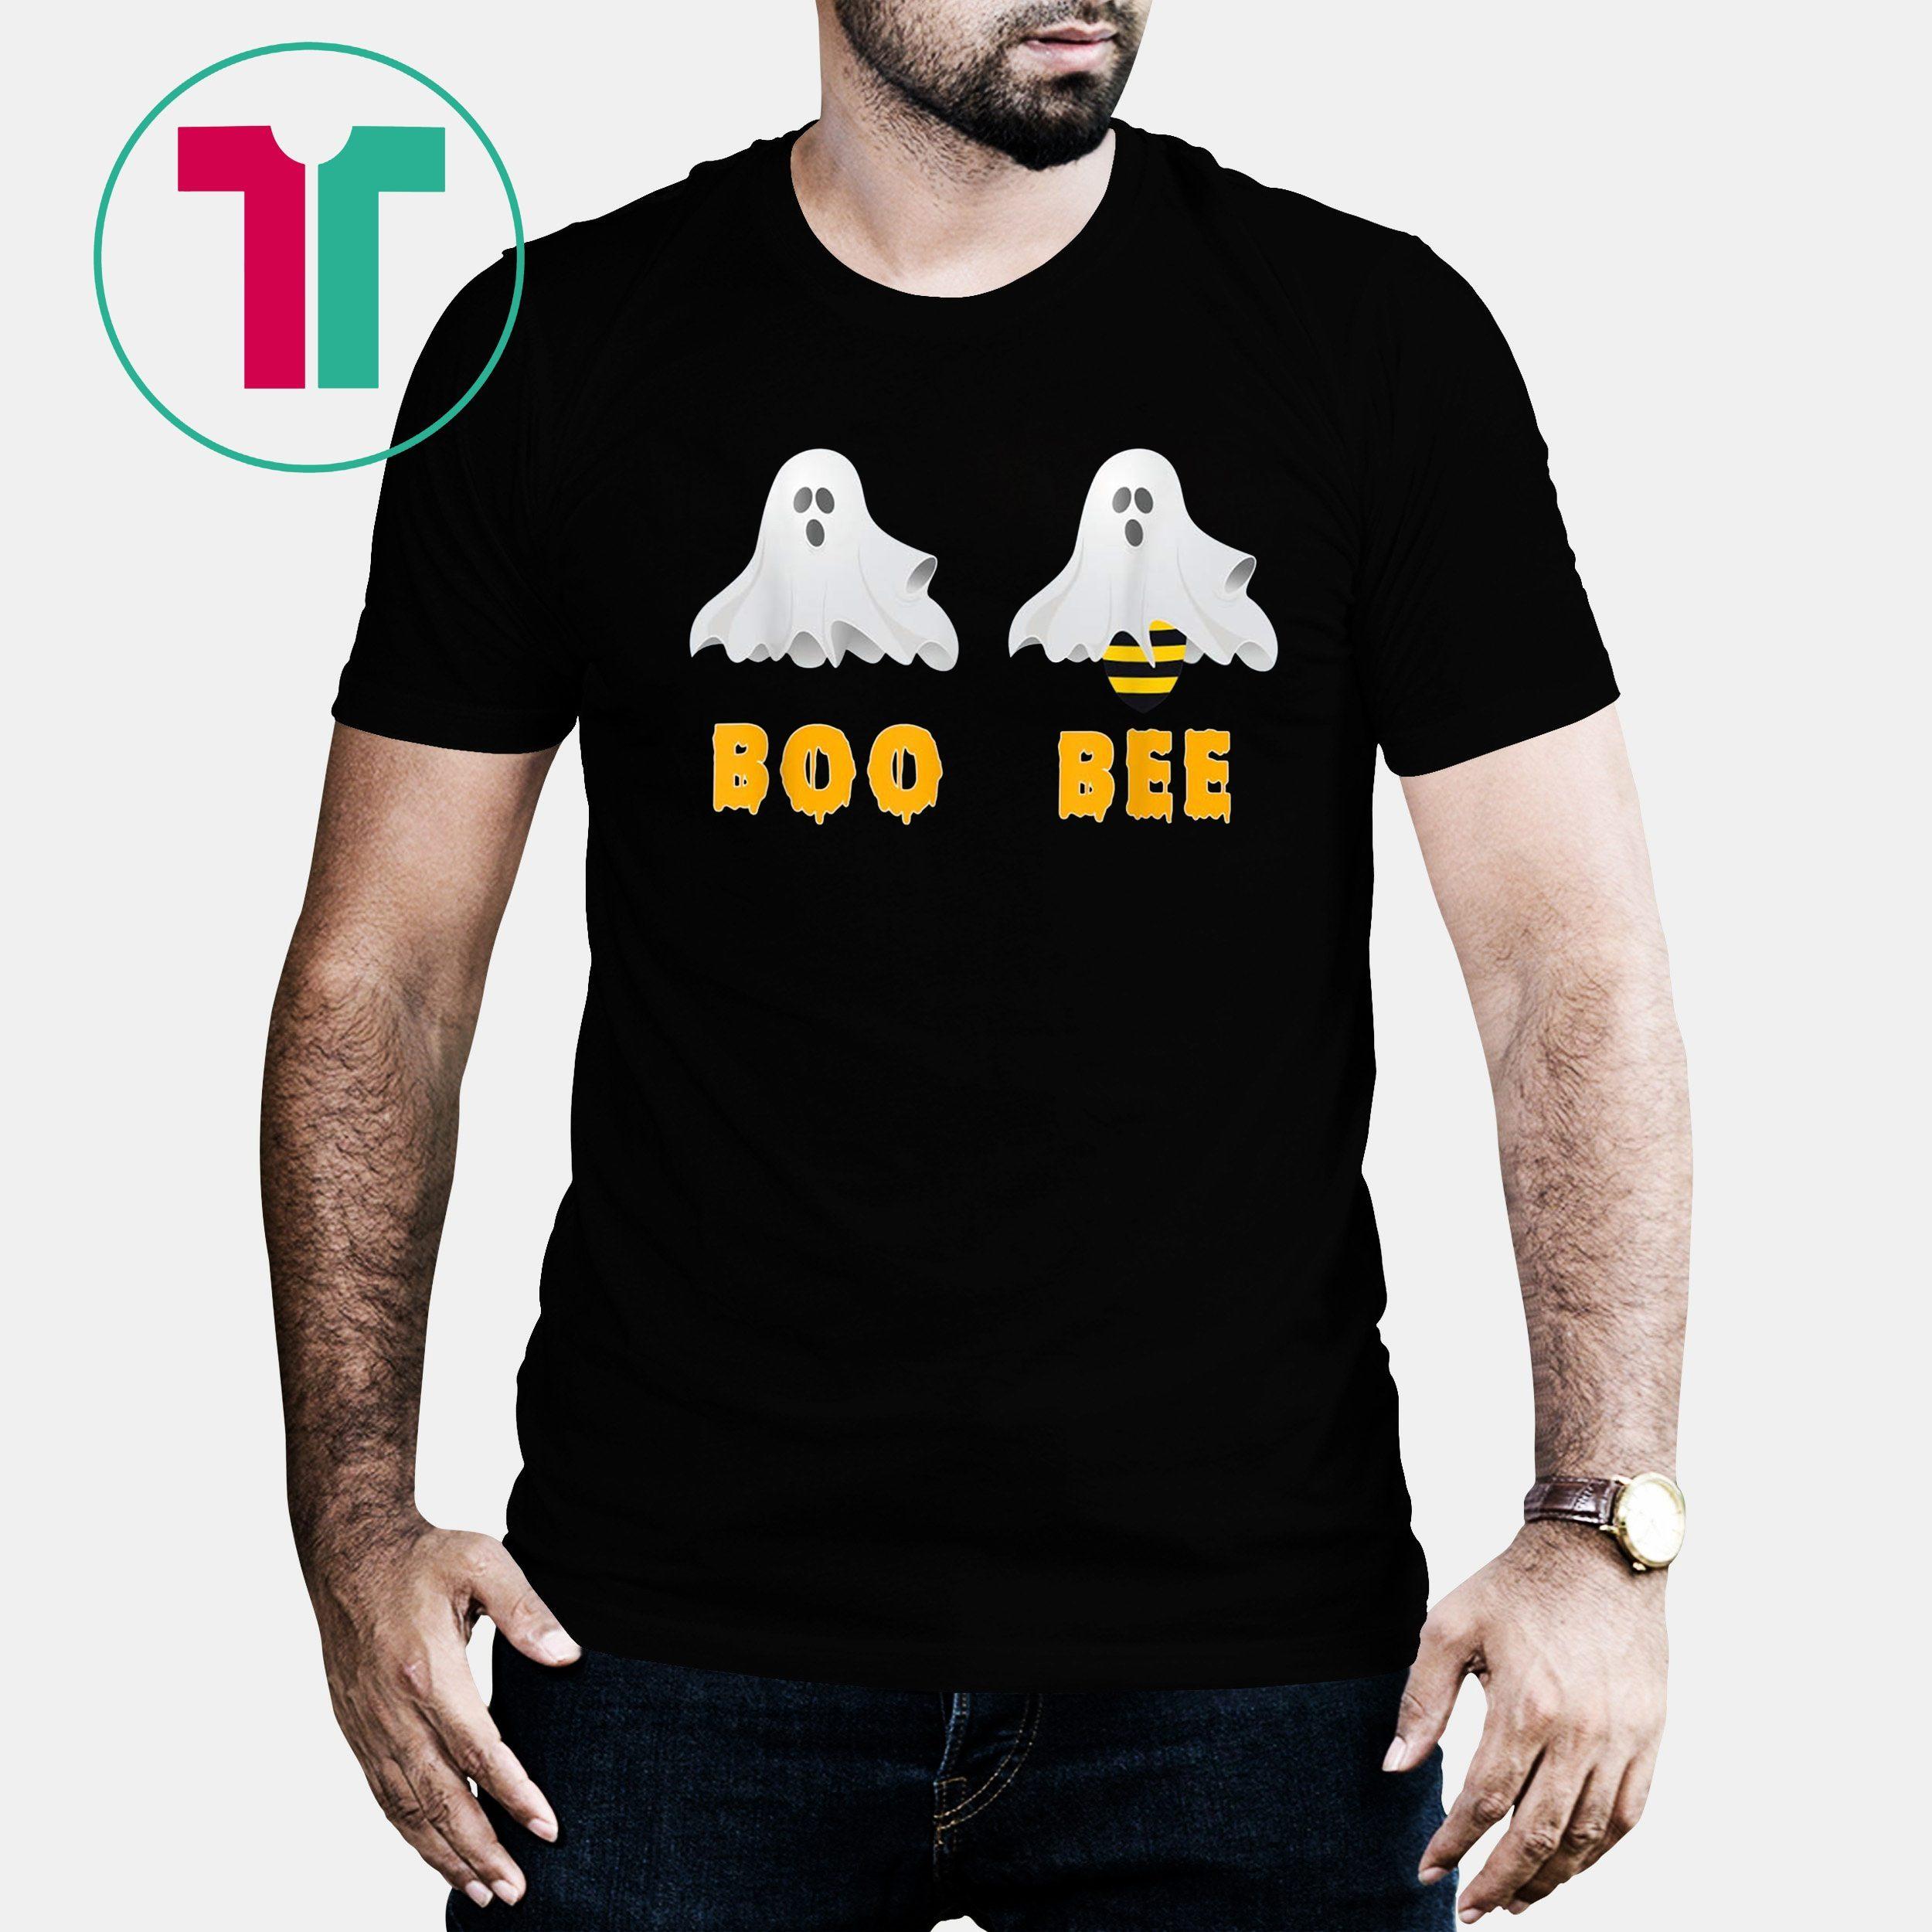 Funny Tee Shirts For Men Kangaroo Down Under Men/'s T-Shirt